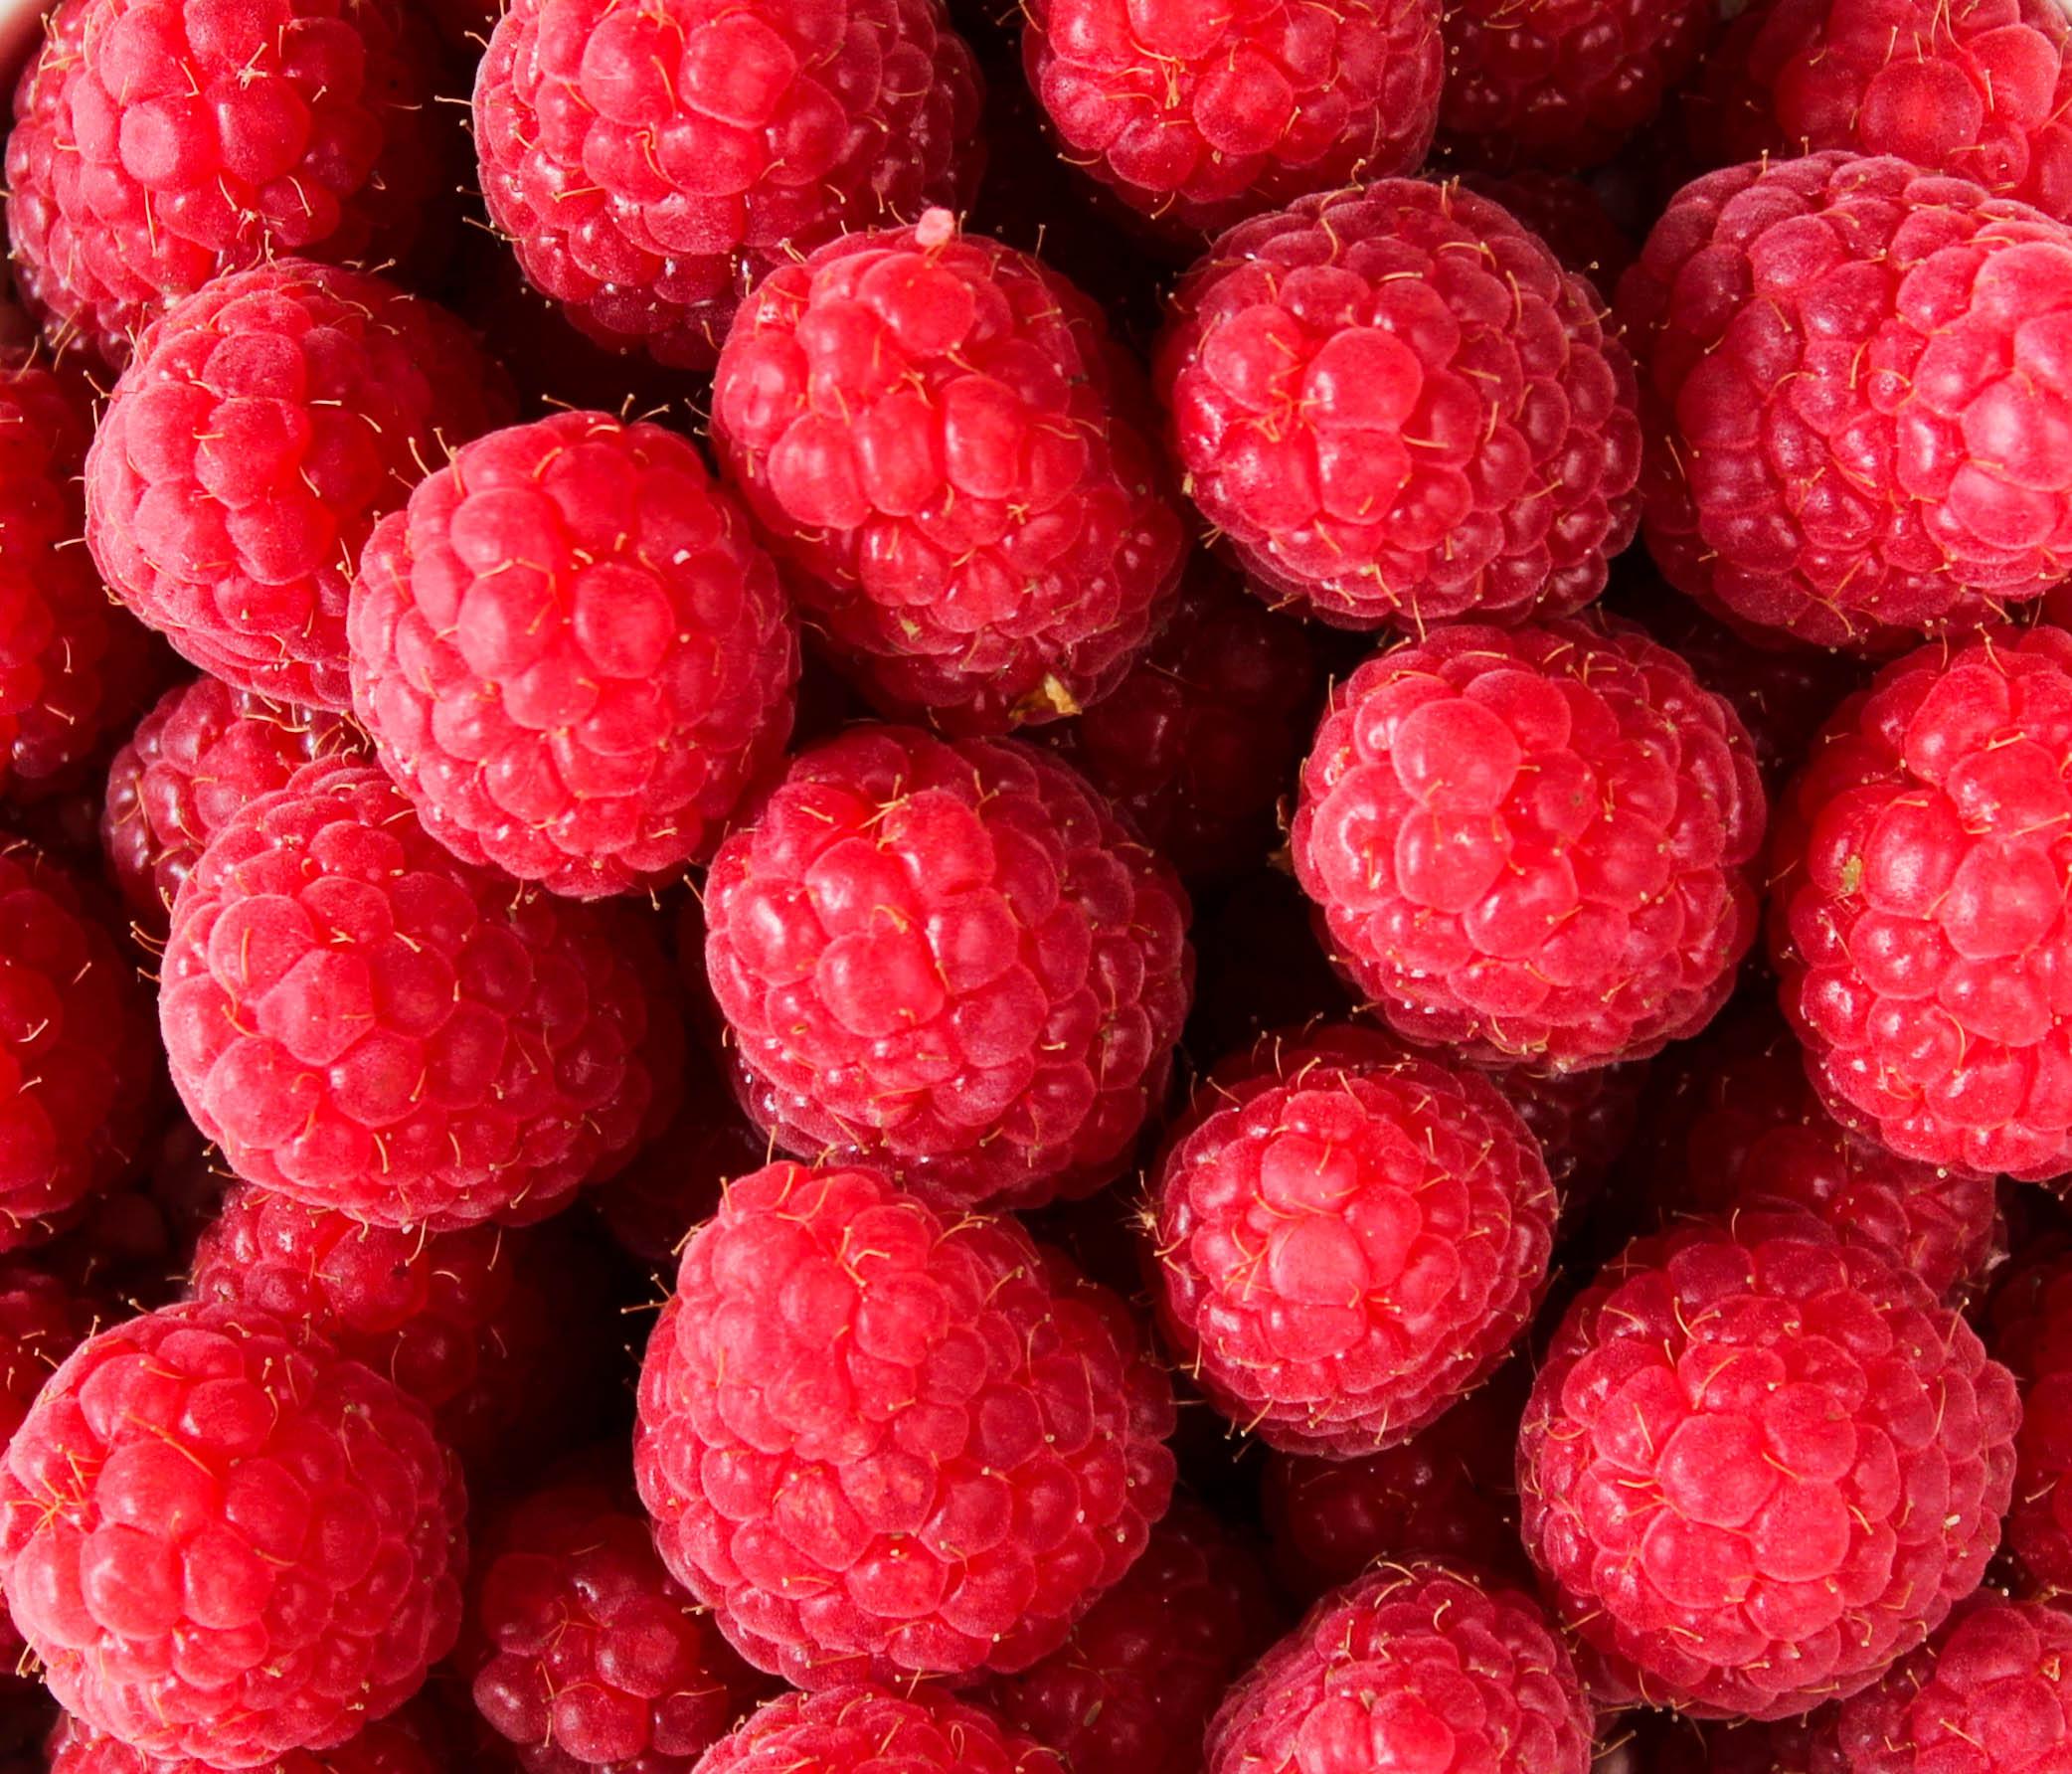 lamponi ricetta per gustarli in cucina foto frutti